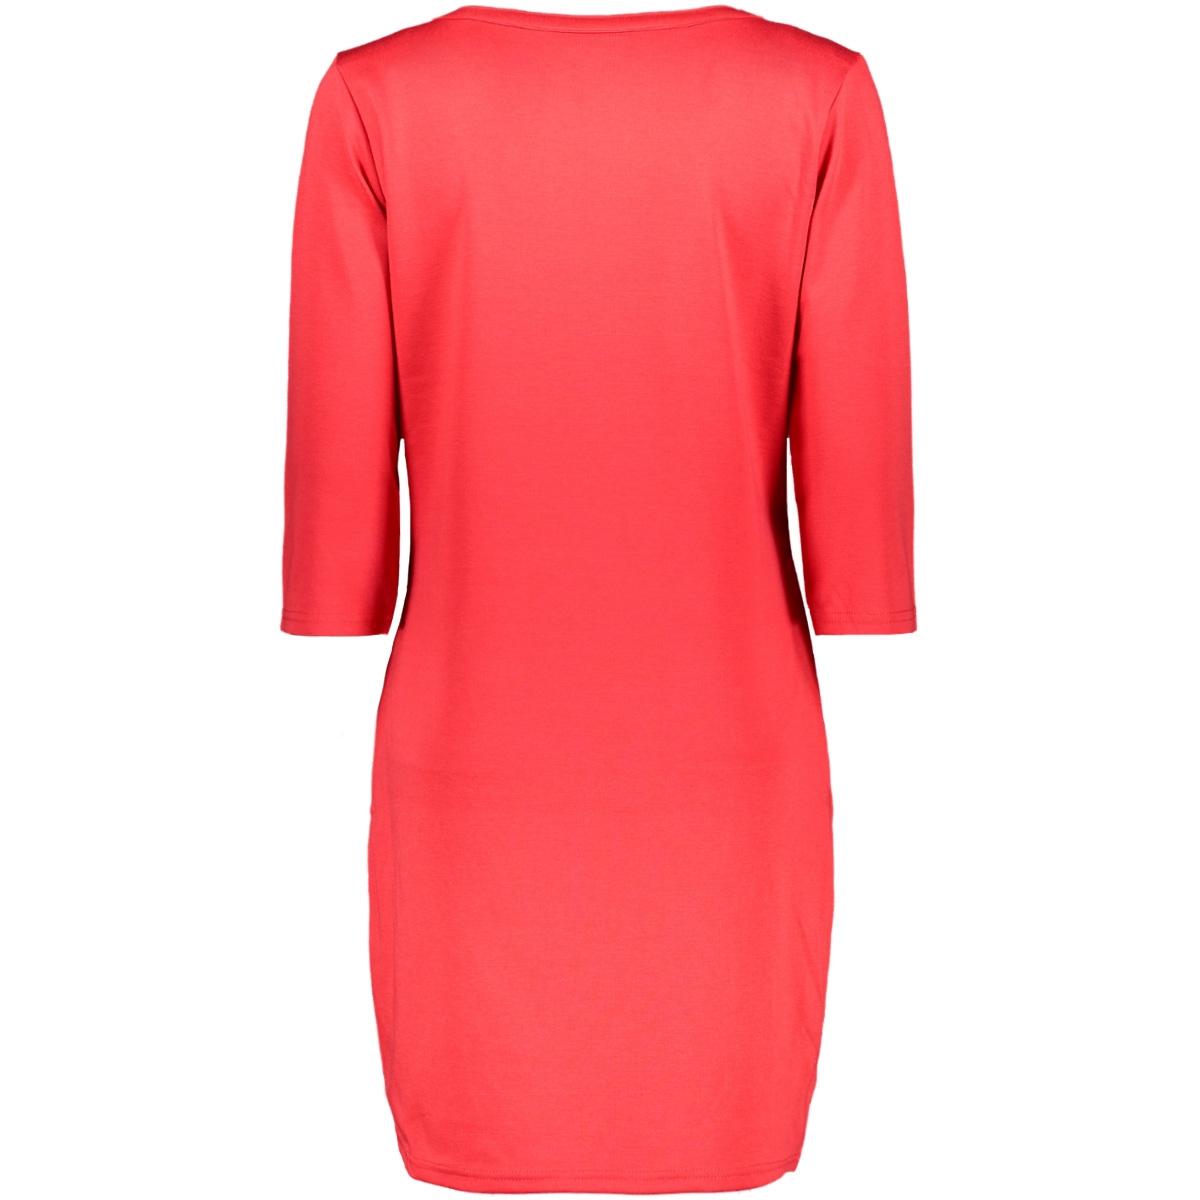 vitinny 3/4 sleeve v-neck dress 14052539 vila jurk tomato puree